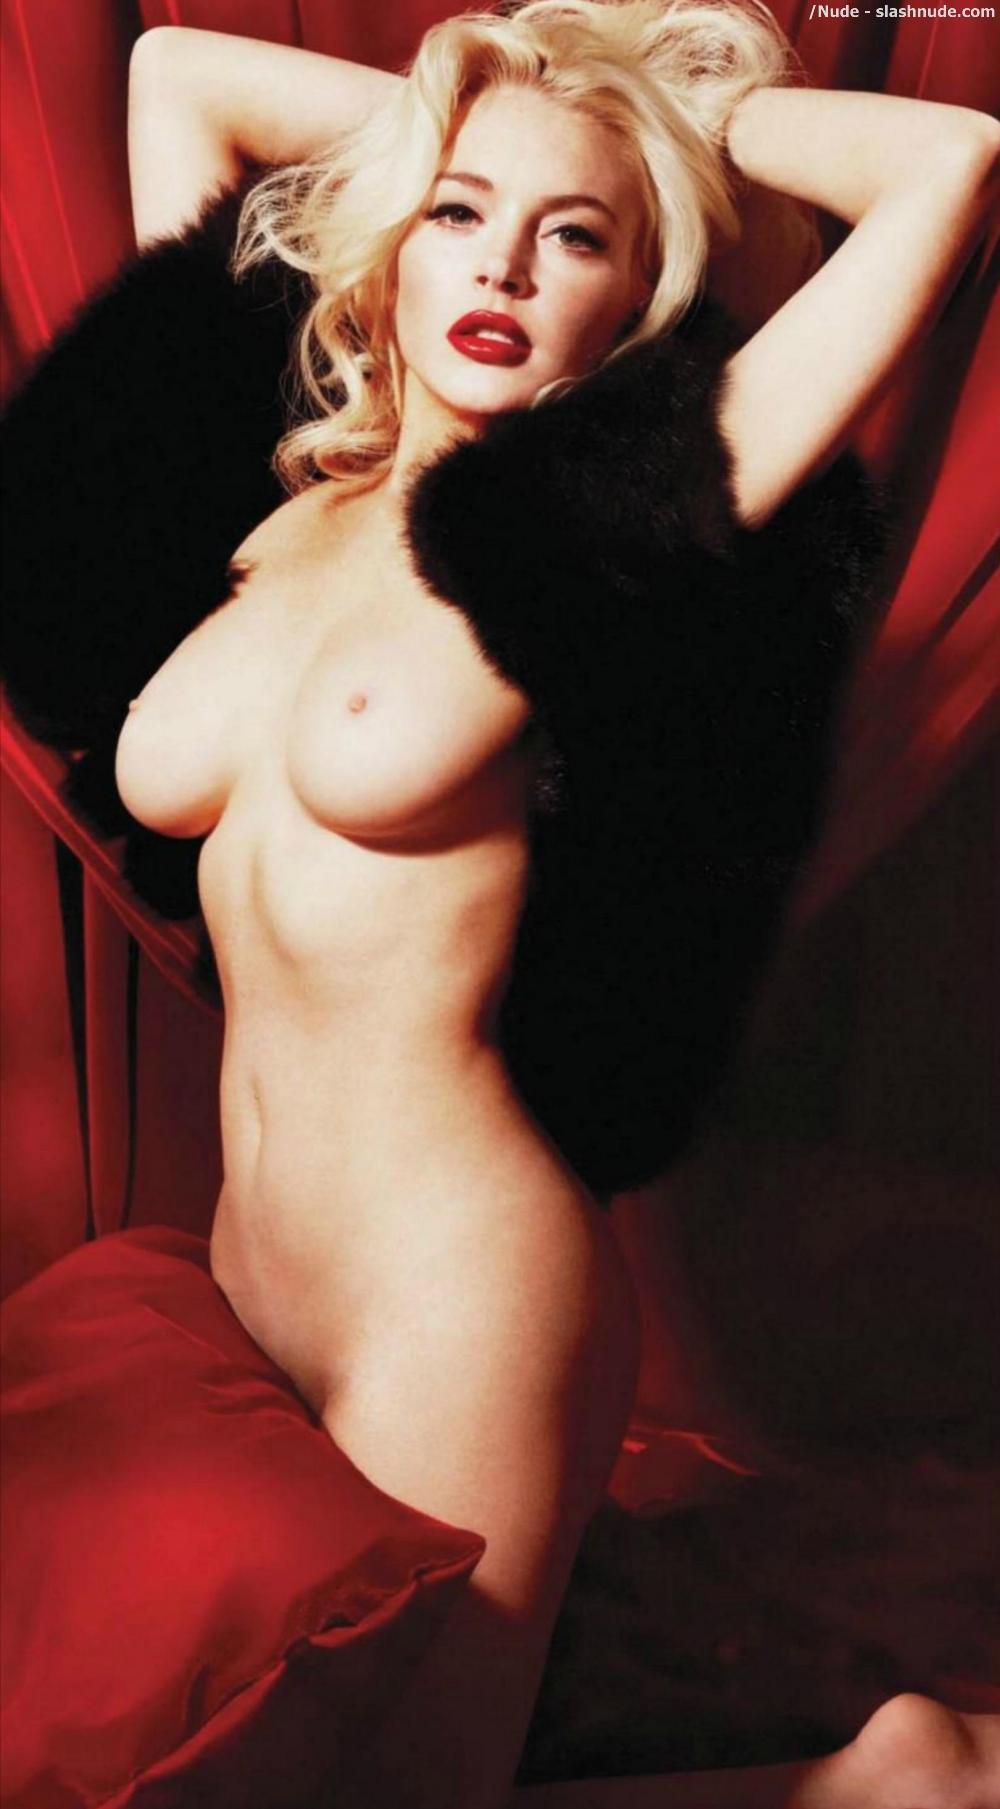 Bikini Lindsay Lohan Marilyn Monroe Nude Pic